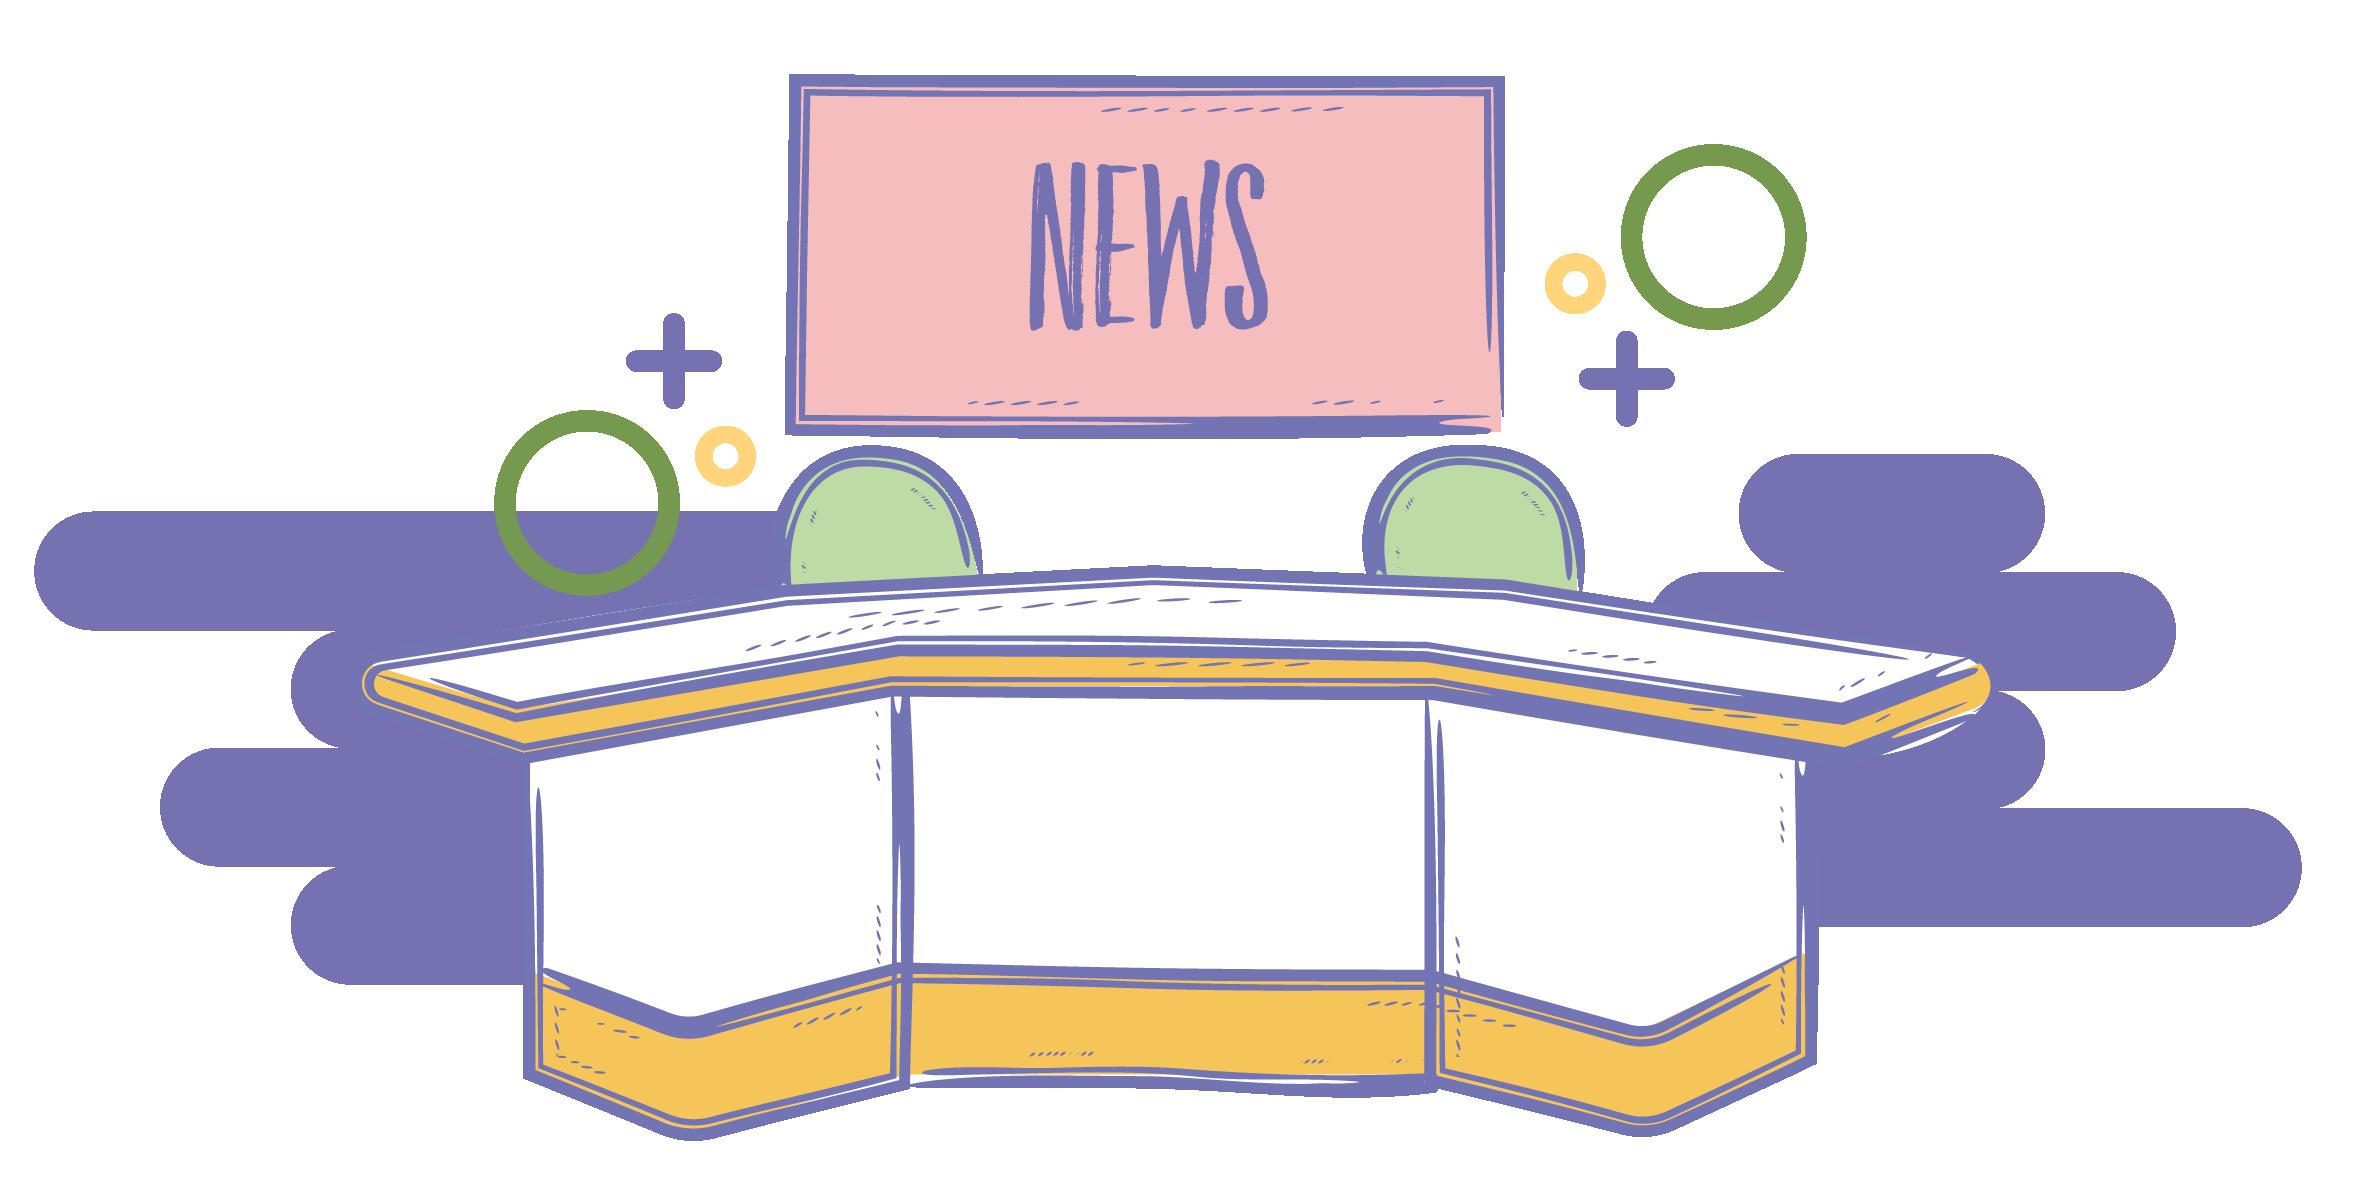 News Room Clipart.